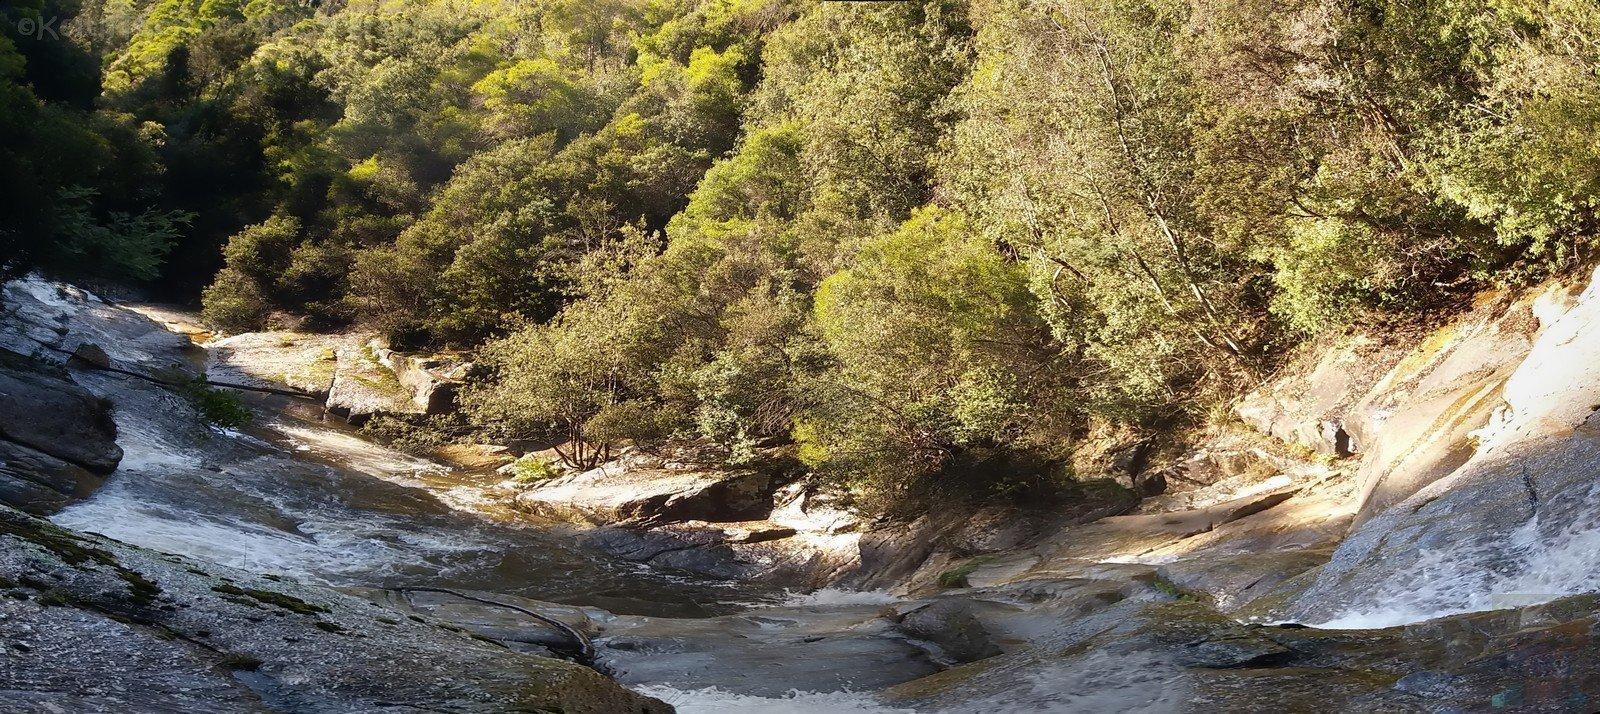 Harridge Falls